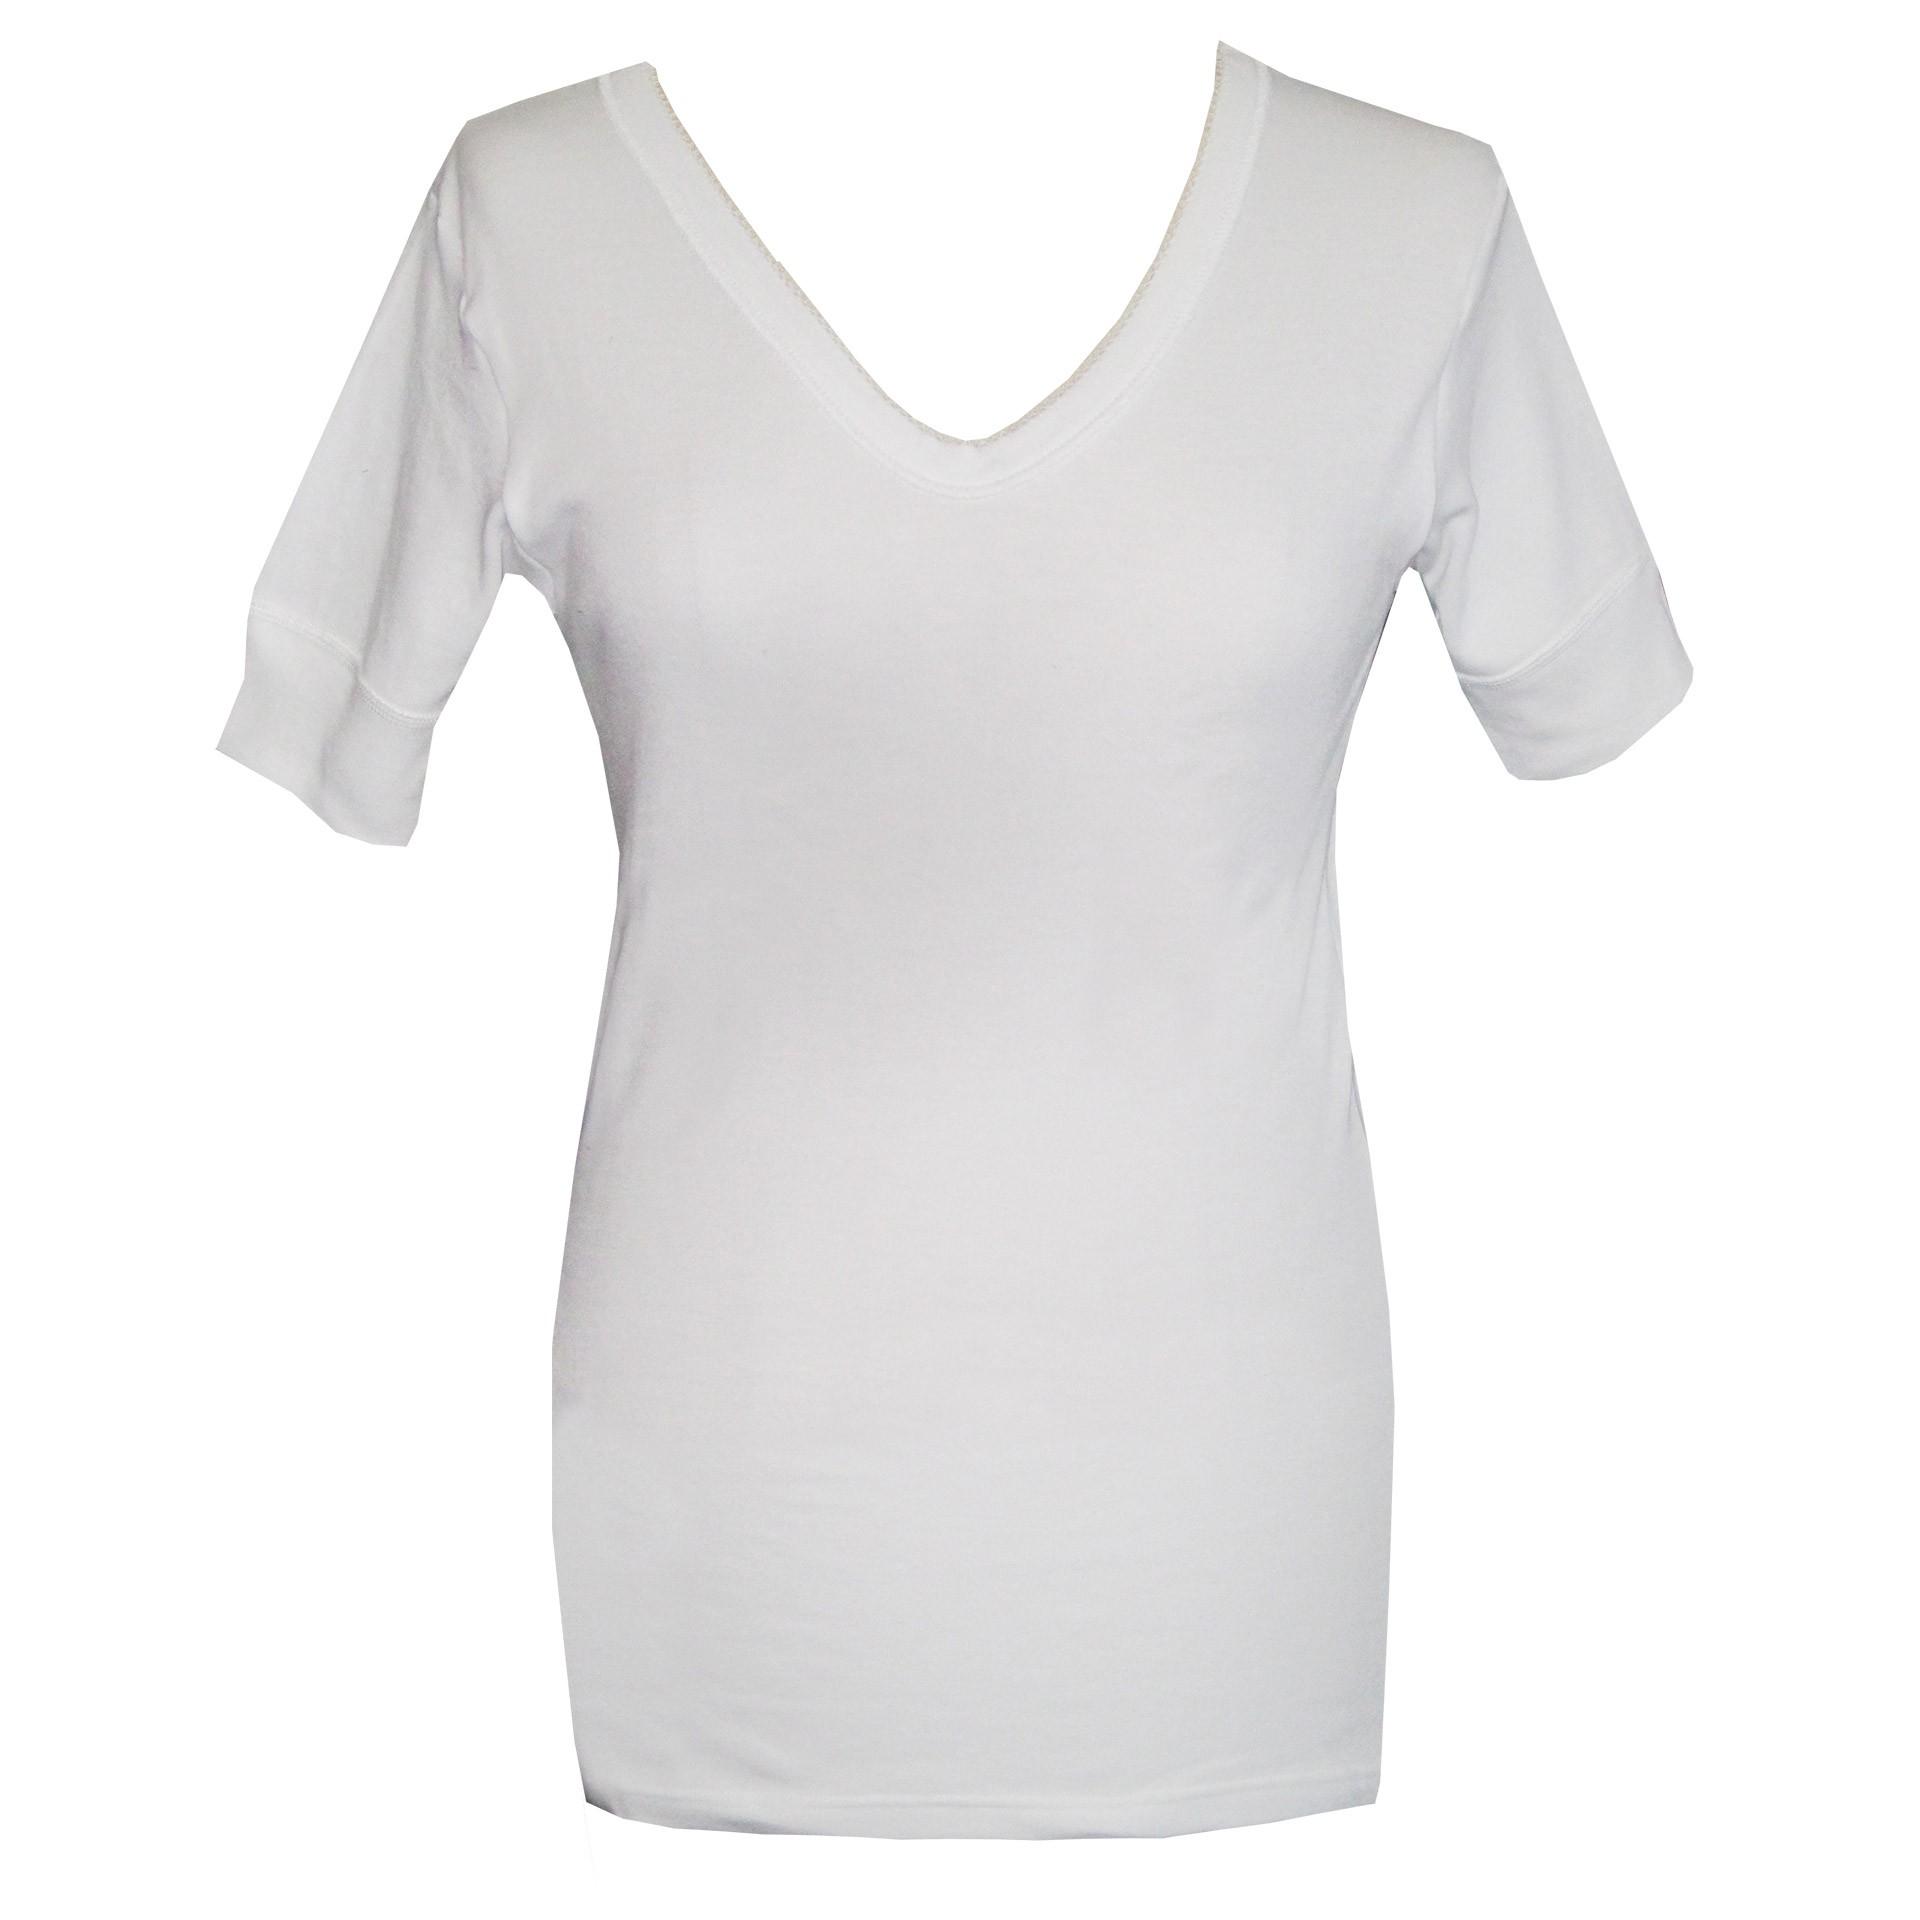 ba66f954f356 Dedes Thermal γυναικεία άσπρη V μακριά κοντομάνικη ισοθερμική μπλούζα  780.5623